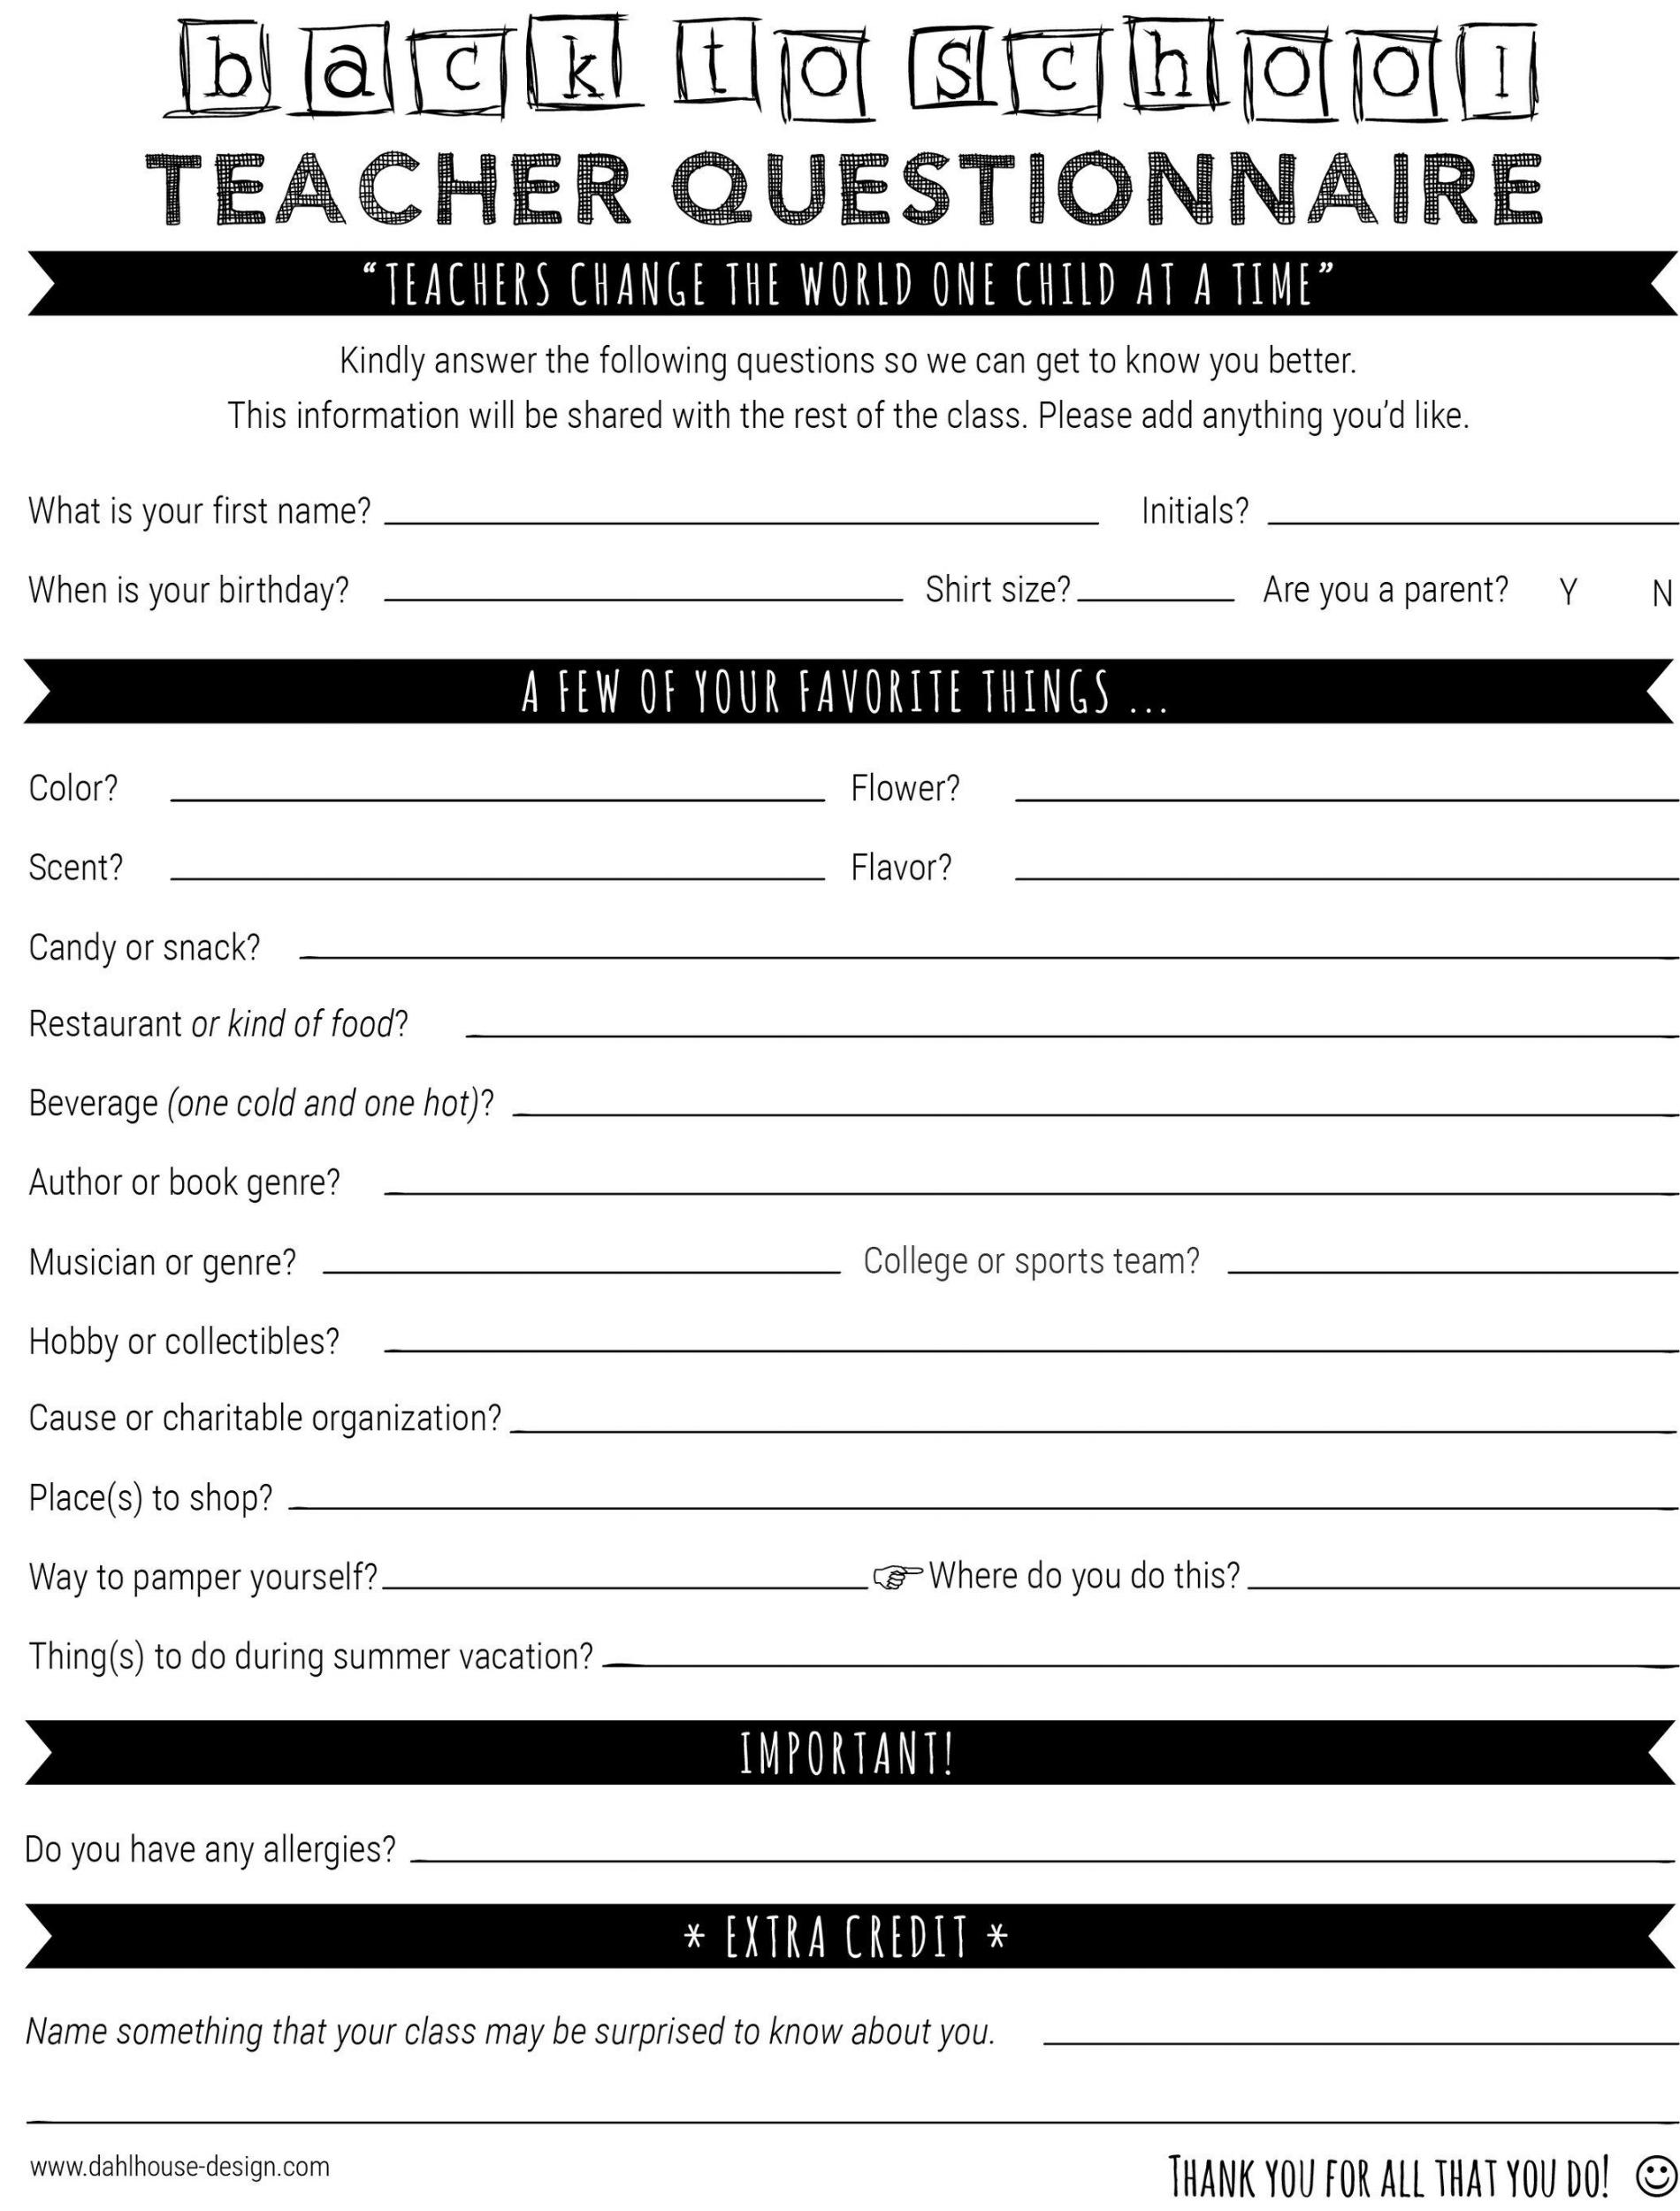 back to school teacher questionnaire